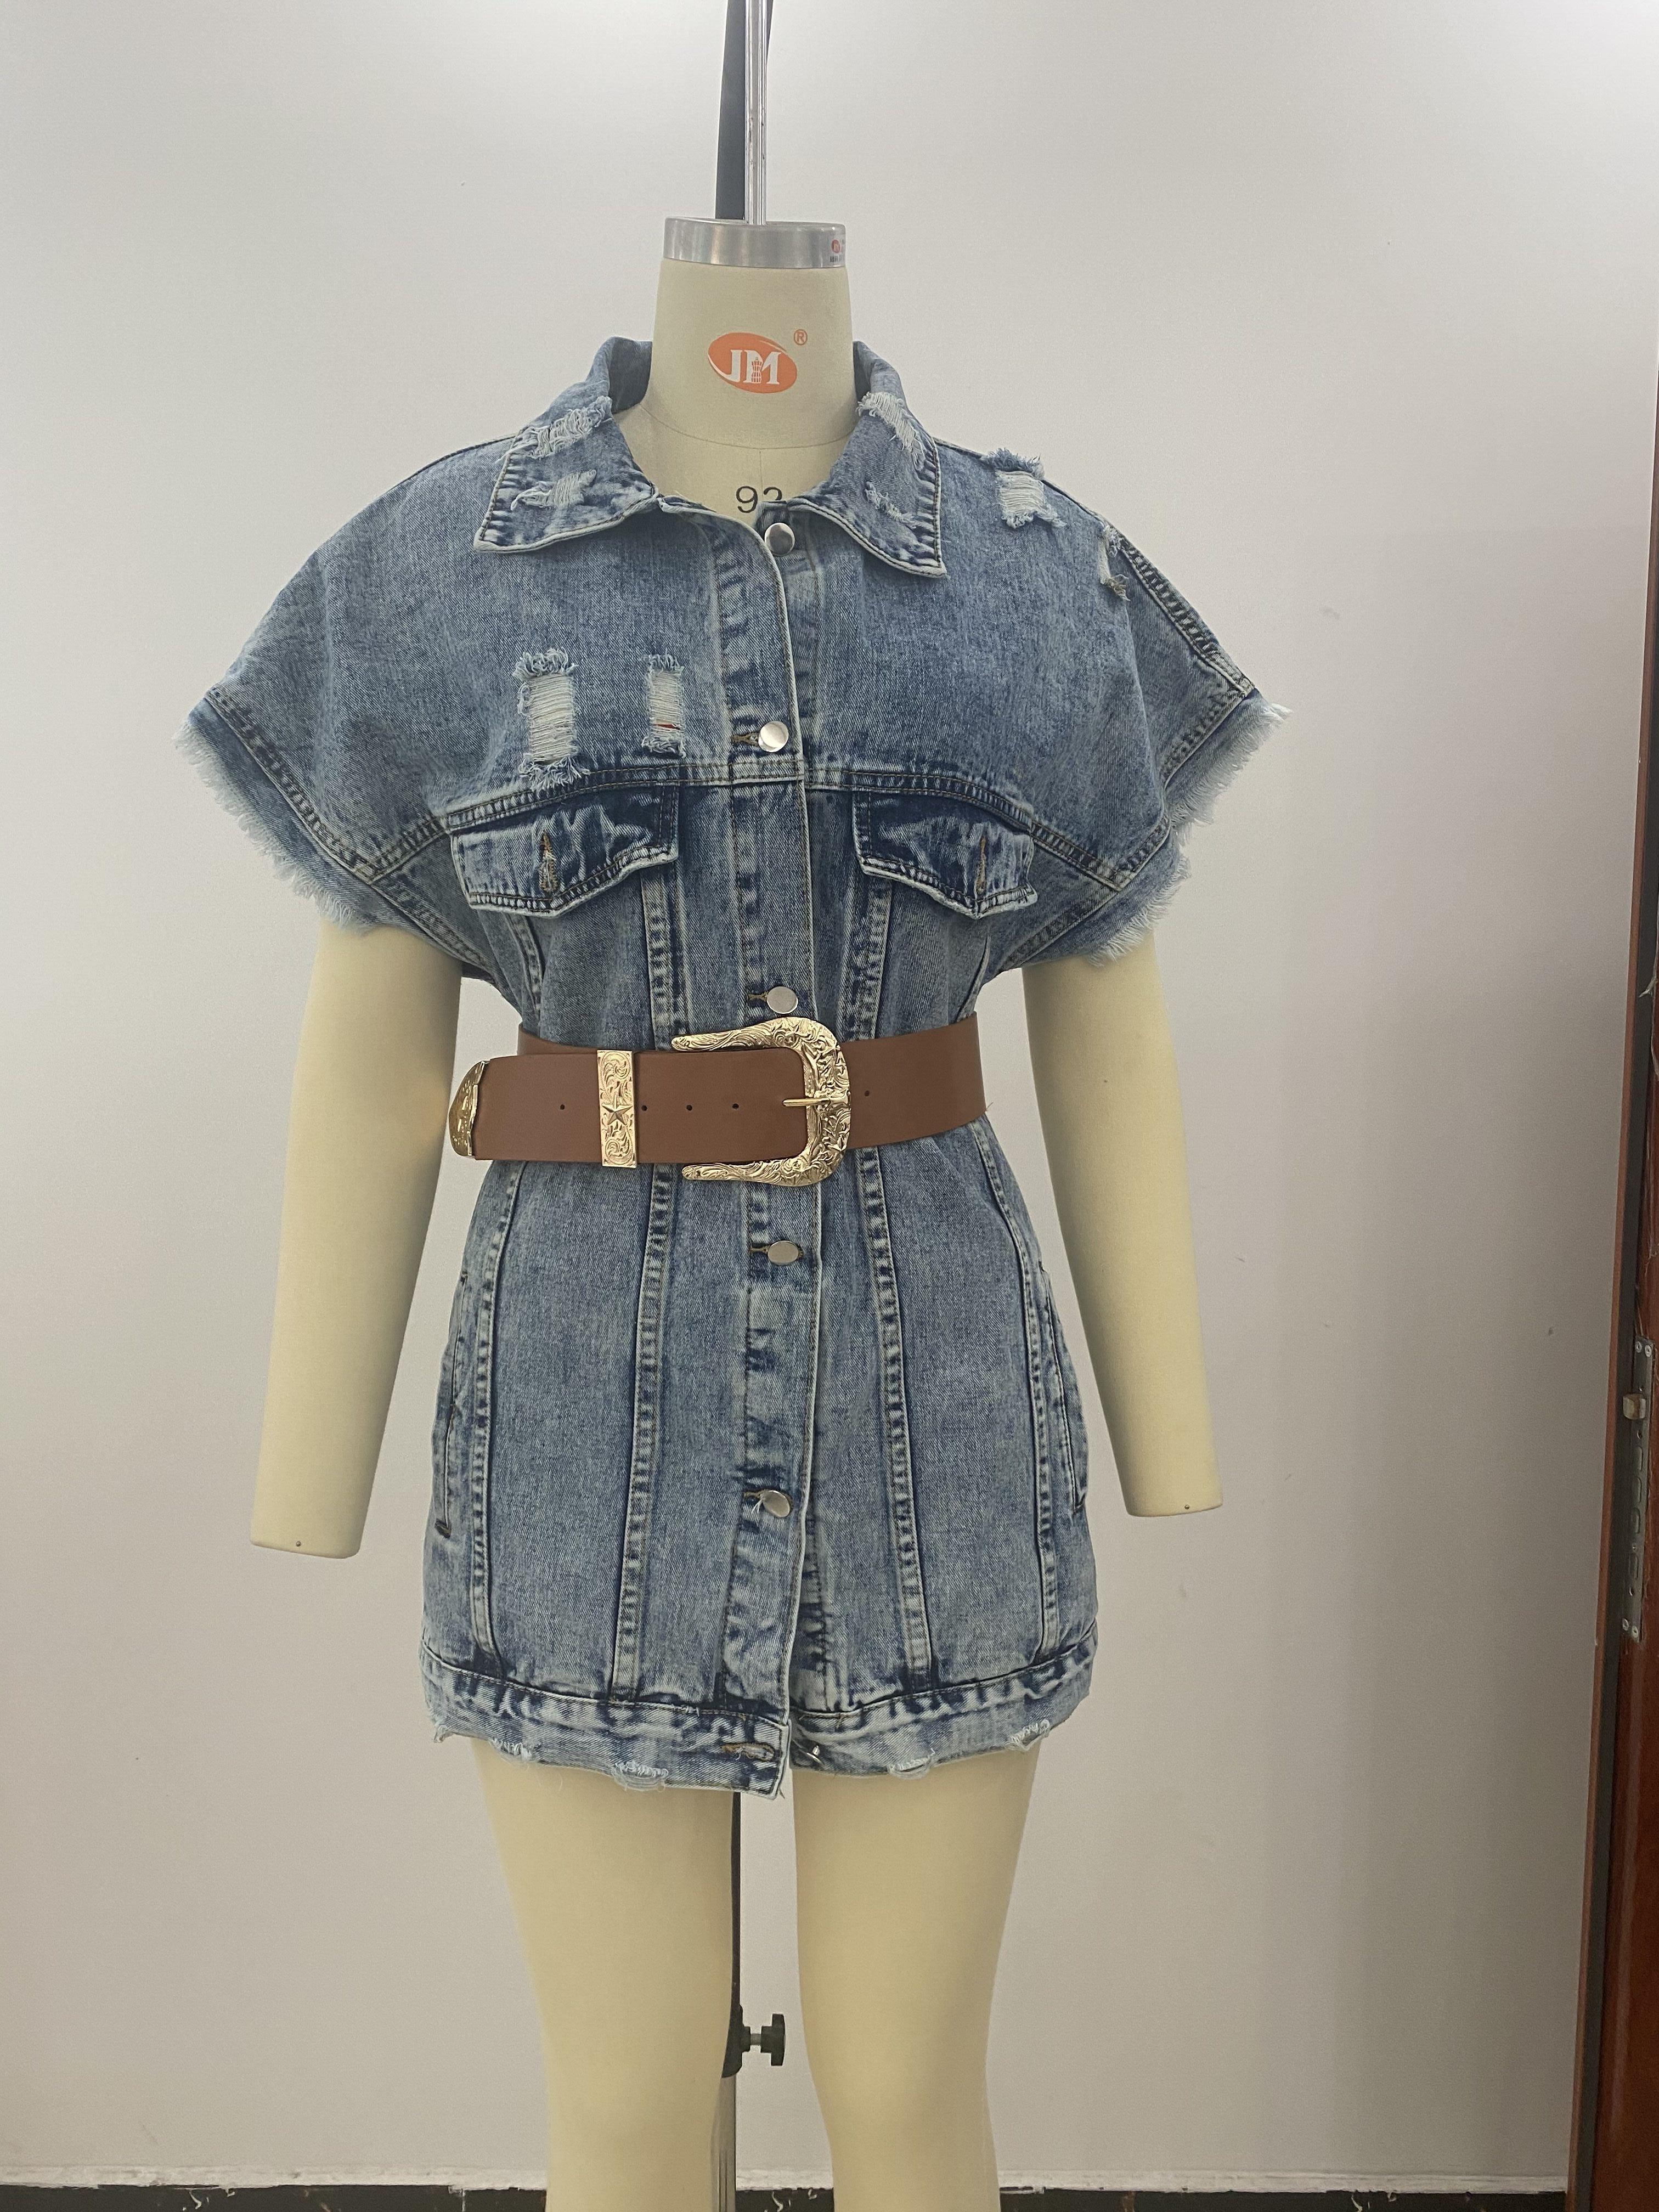 Loose Fit Sleeveless Long Jeans Waistcoat Dress Single Buttoned Turn Down Collar Ribbed Plus Size Women Denim Jackets Vest Dress